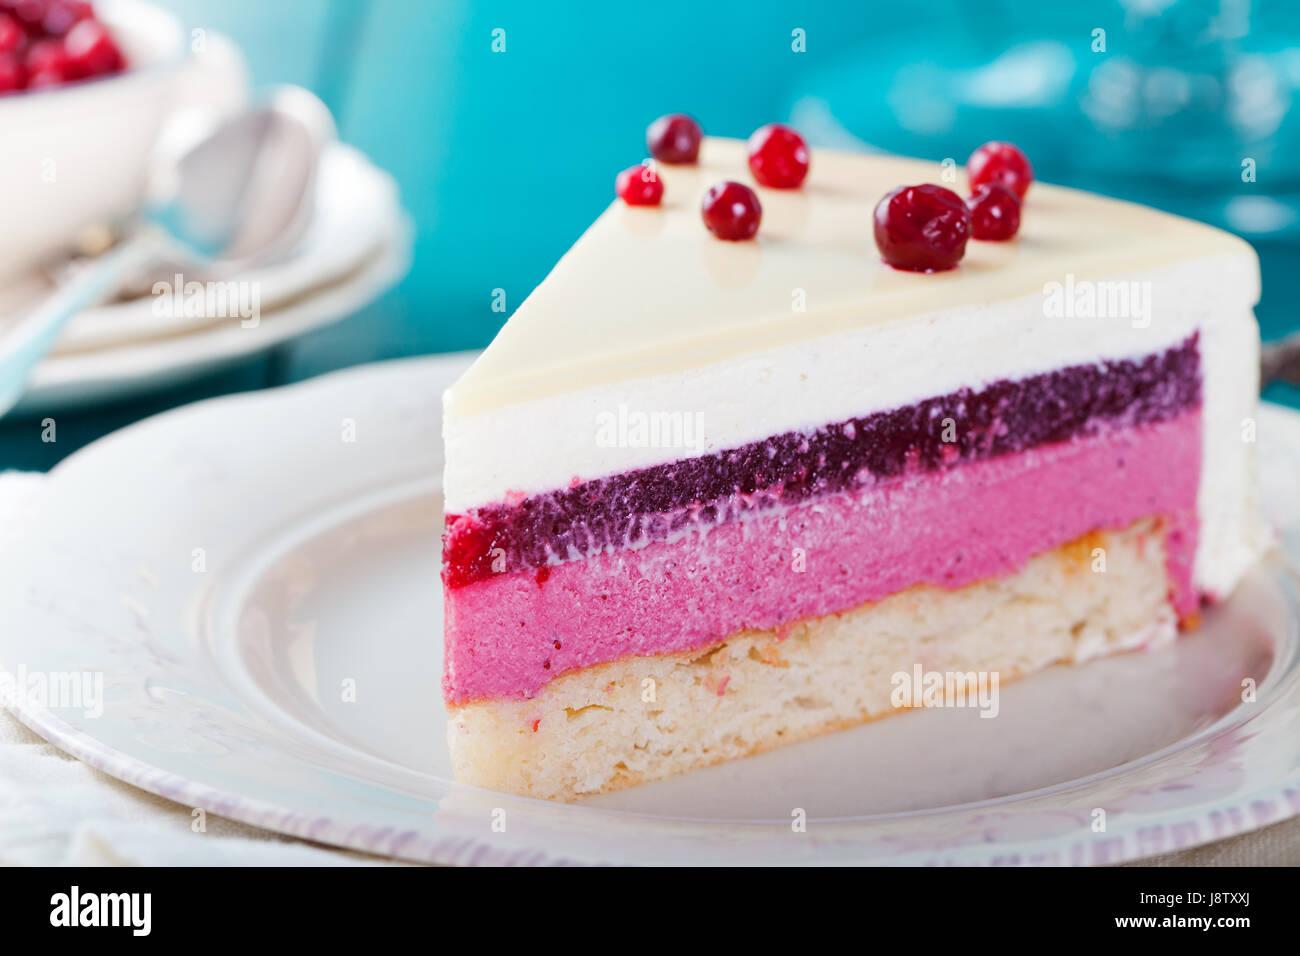 Preiselbeere, Heidelbeere, Himbeere Torte, Mousse Torte. Stockbild